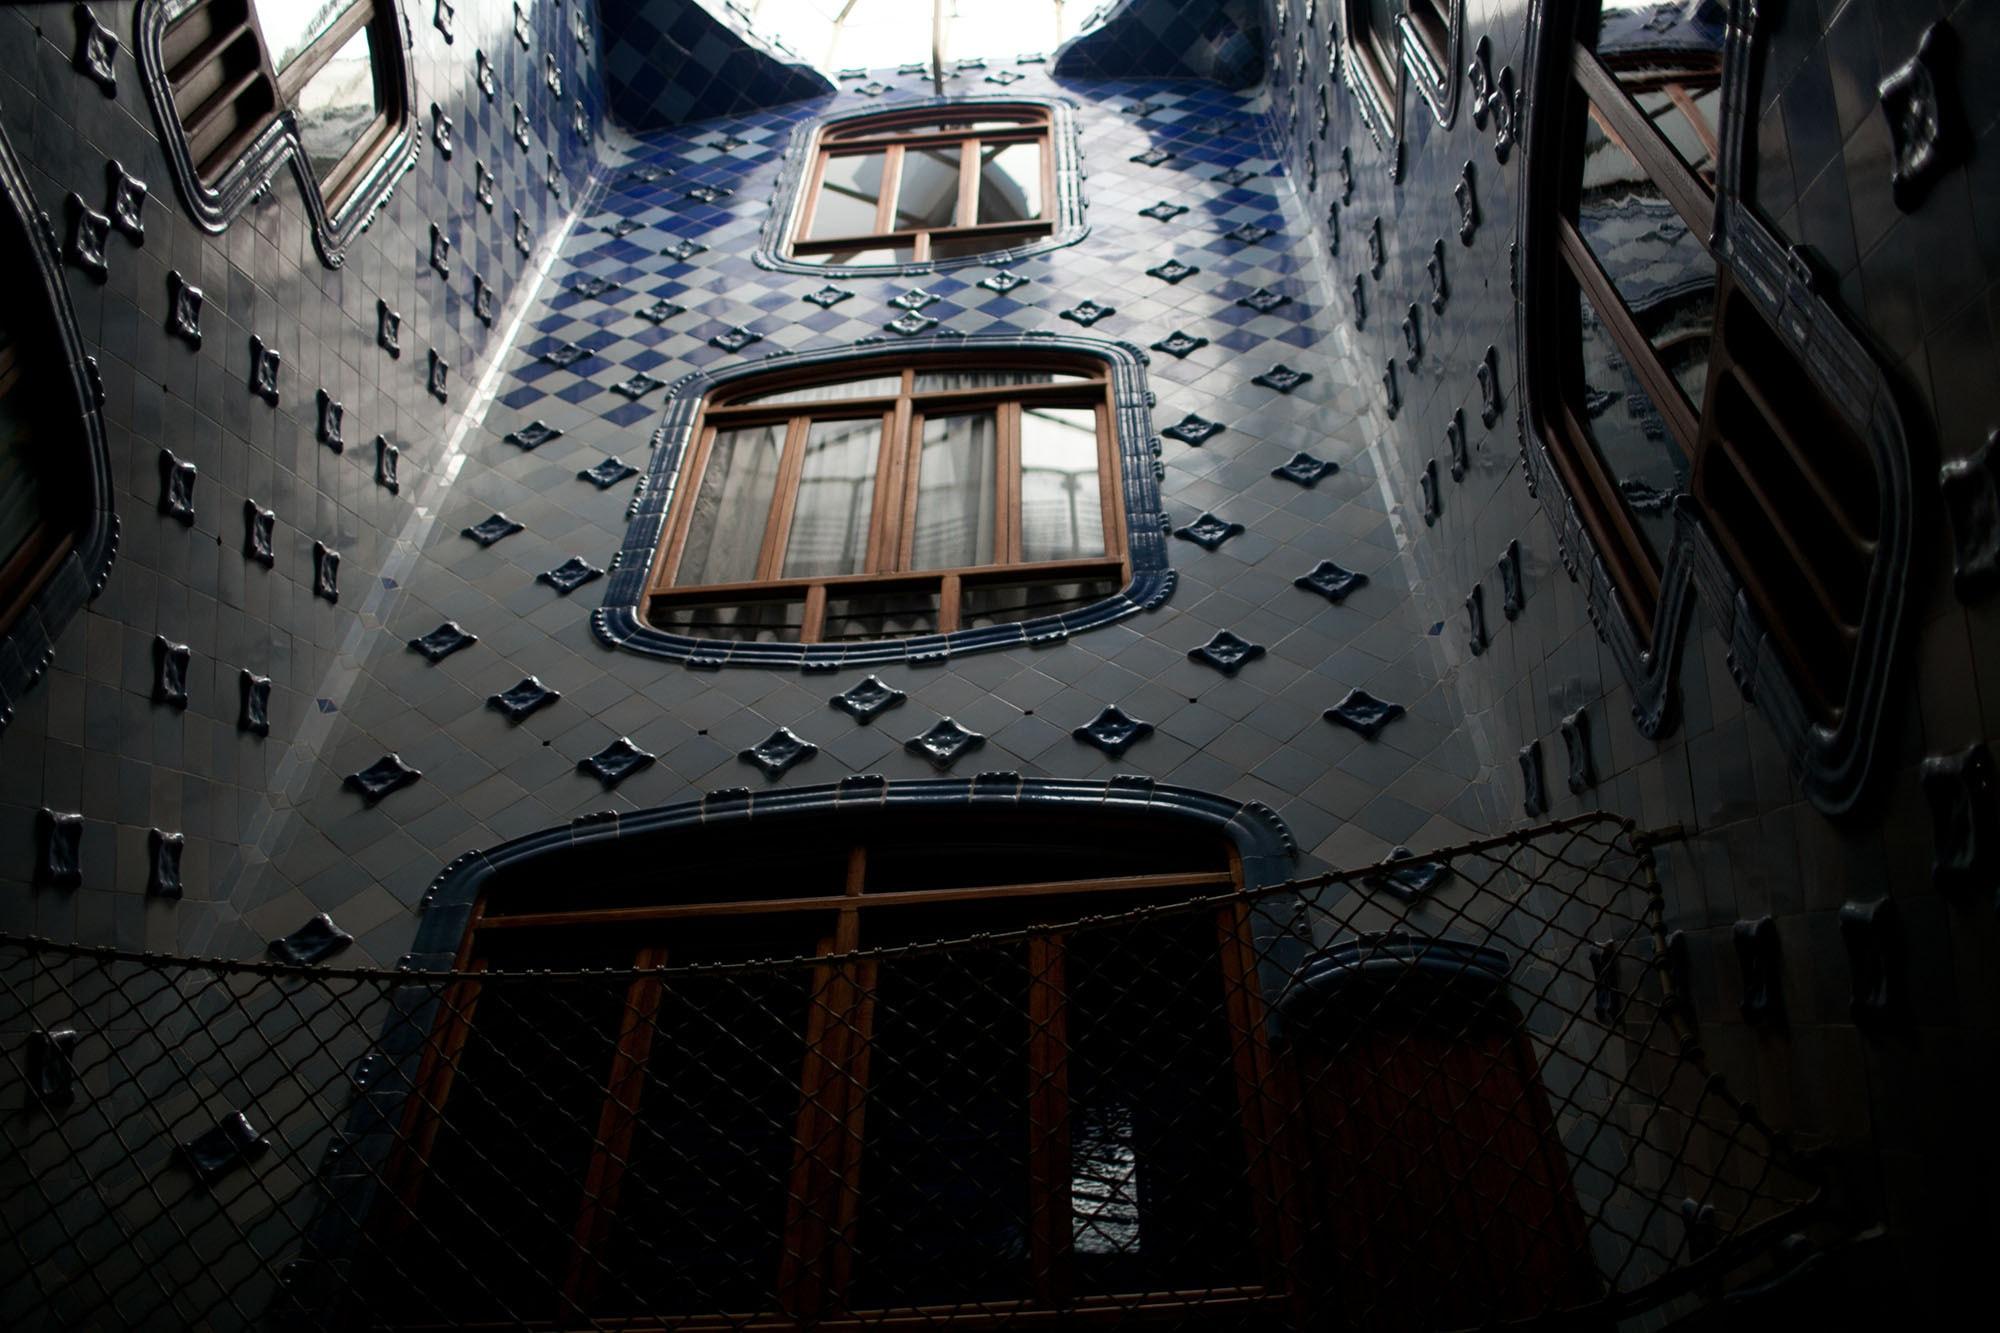 Casa Batllo in Barcelona, Spain